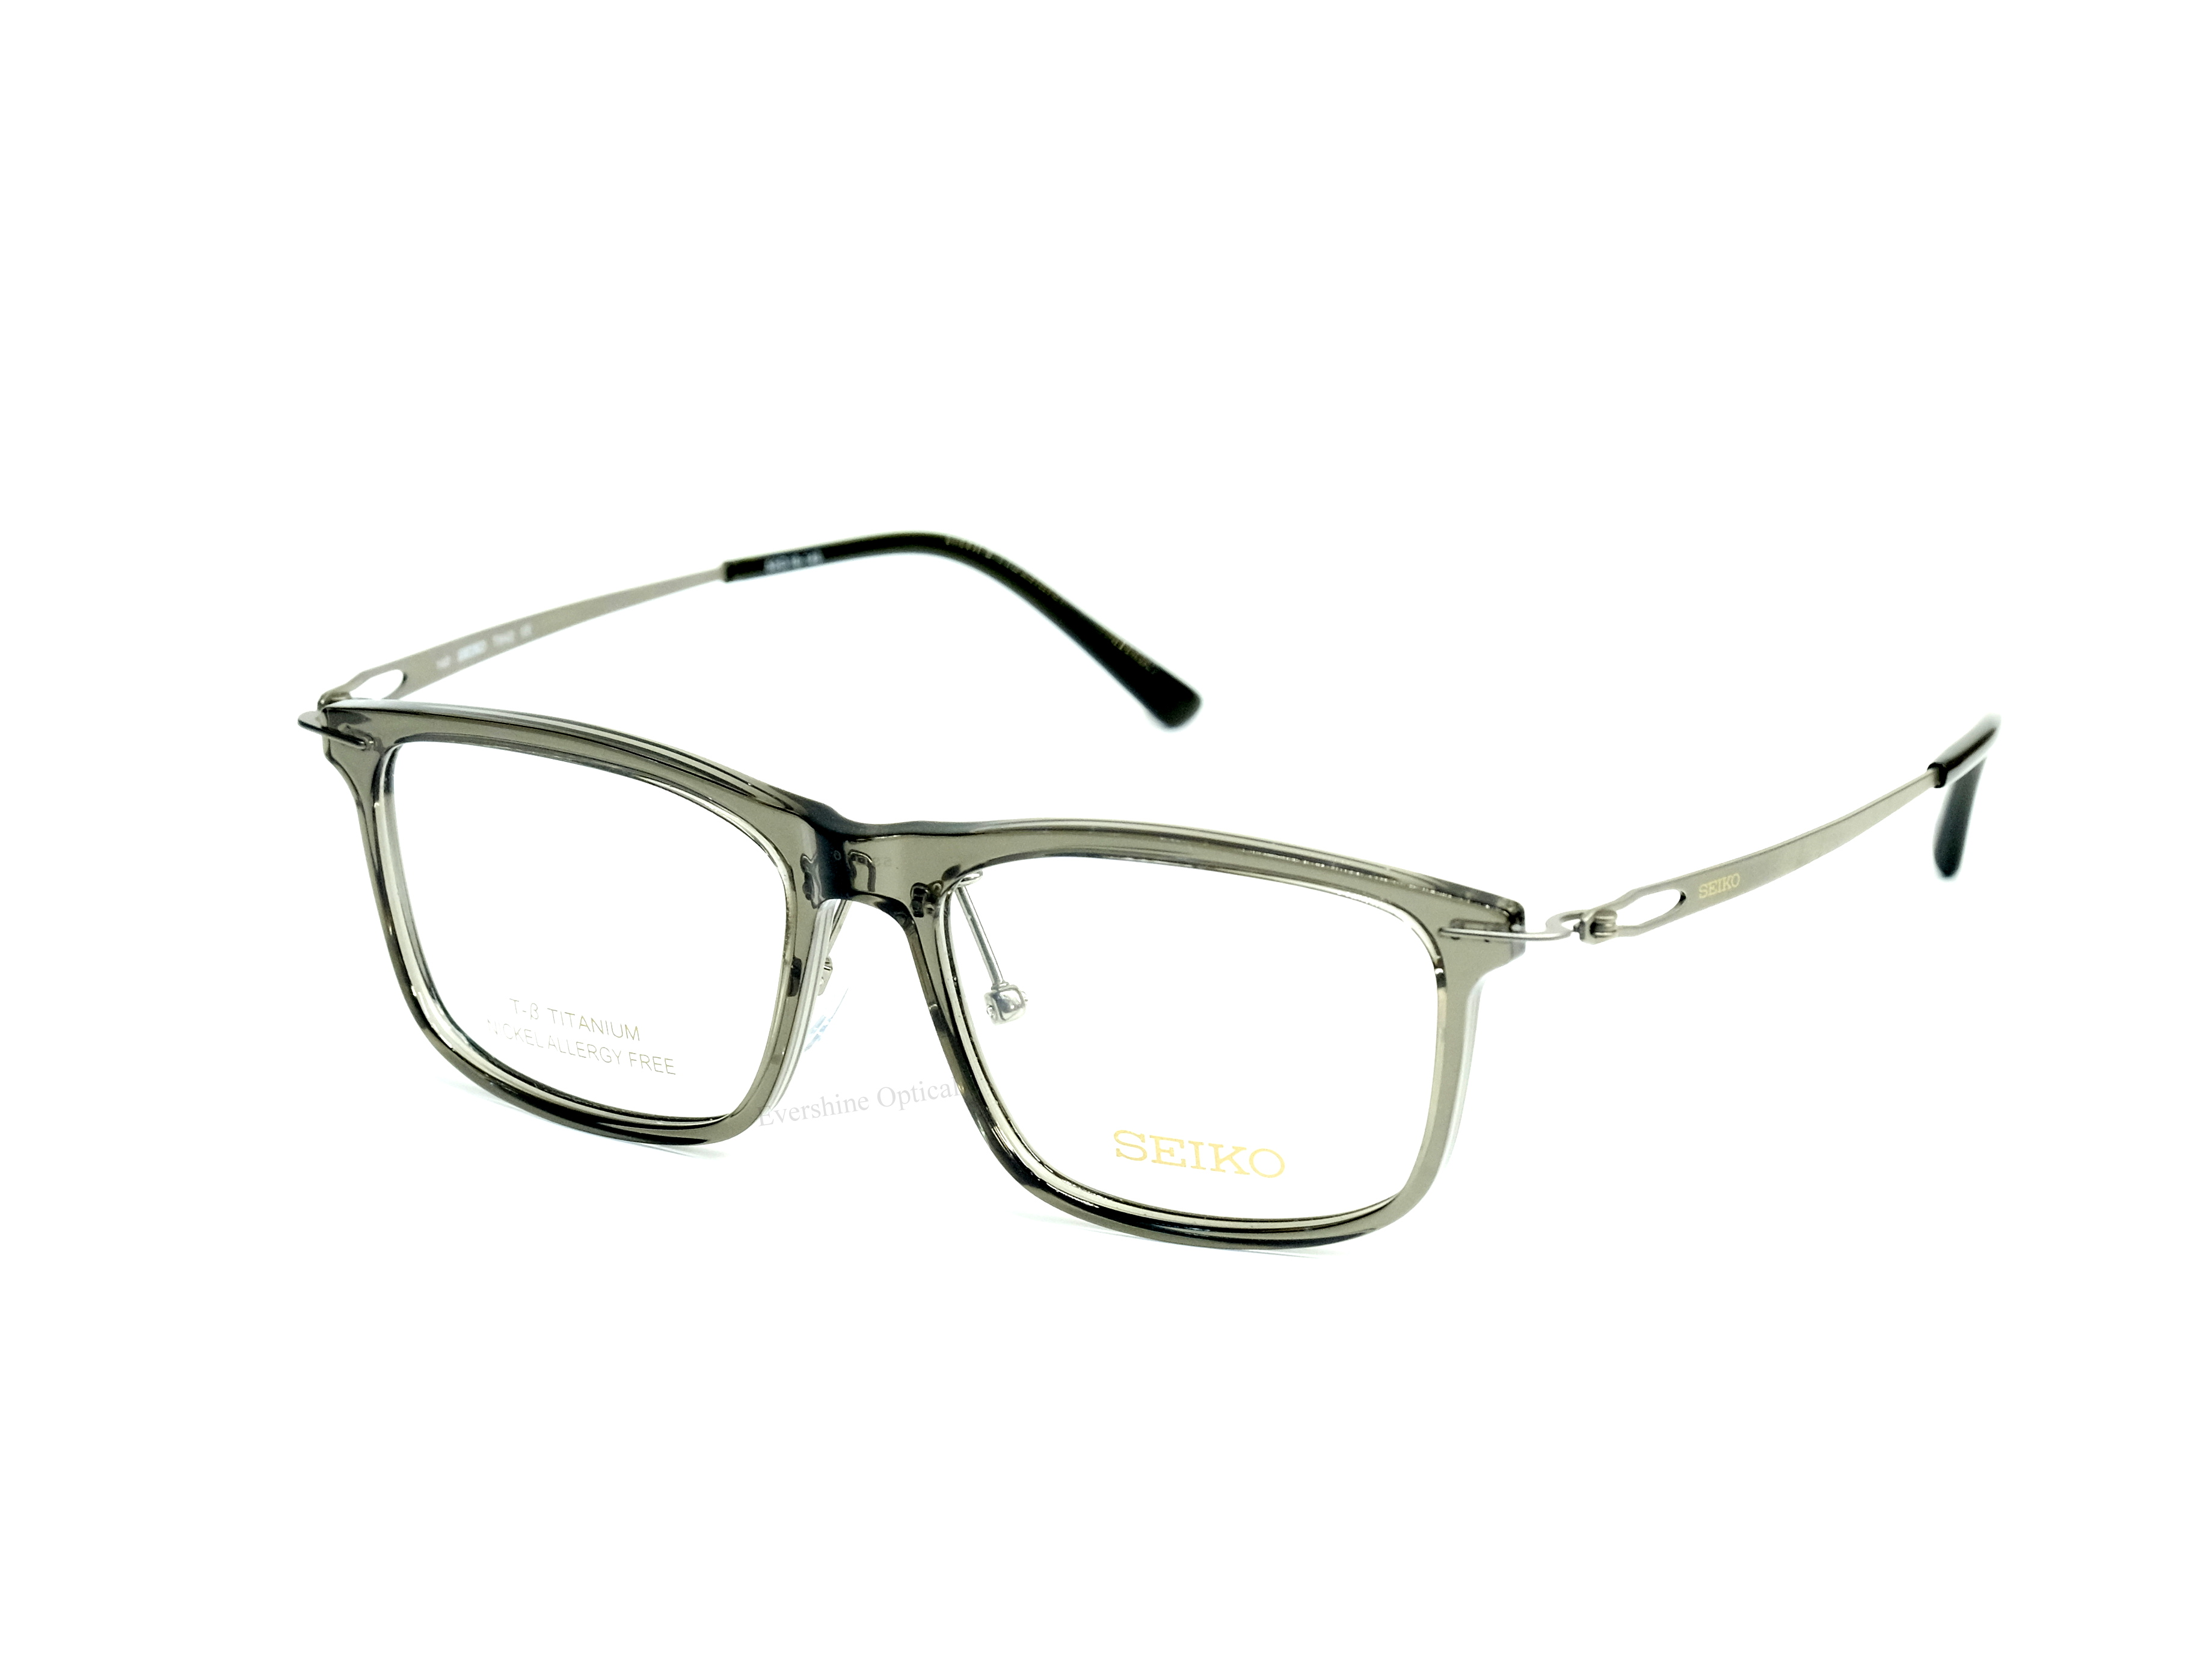 6c2f967faf1 Seiko Glasses Frames - Best Glasses Cnapracticetesting.Com 2018